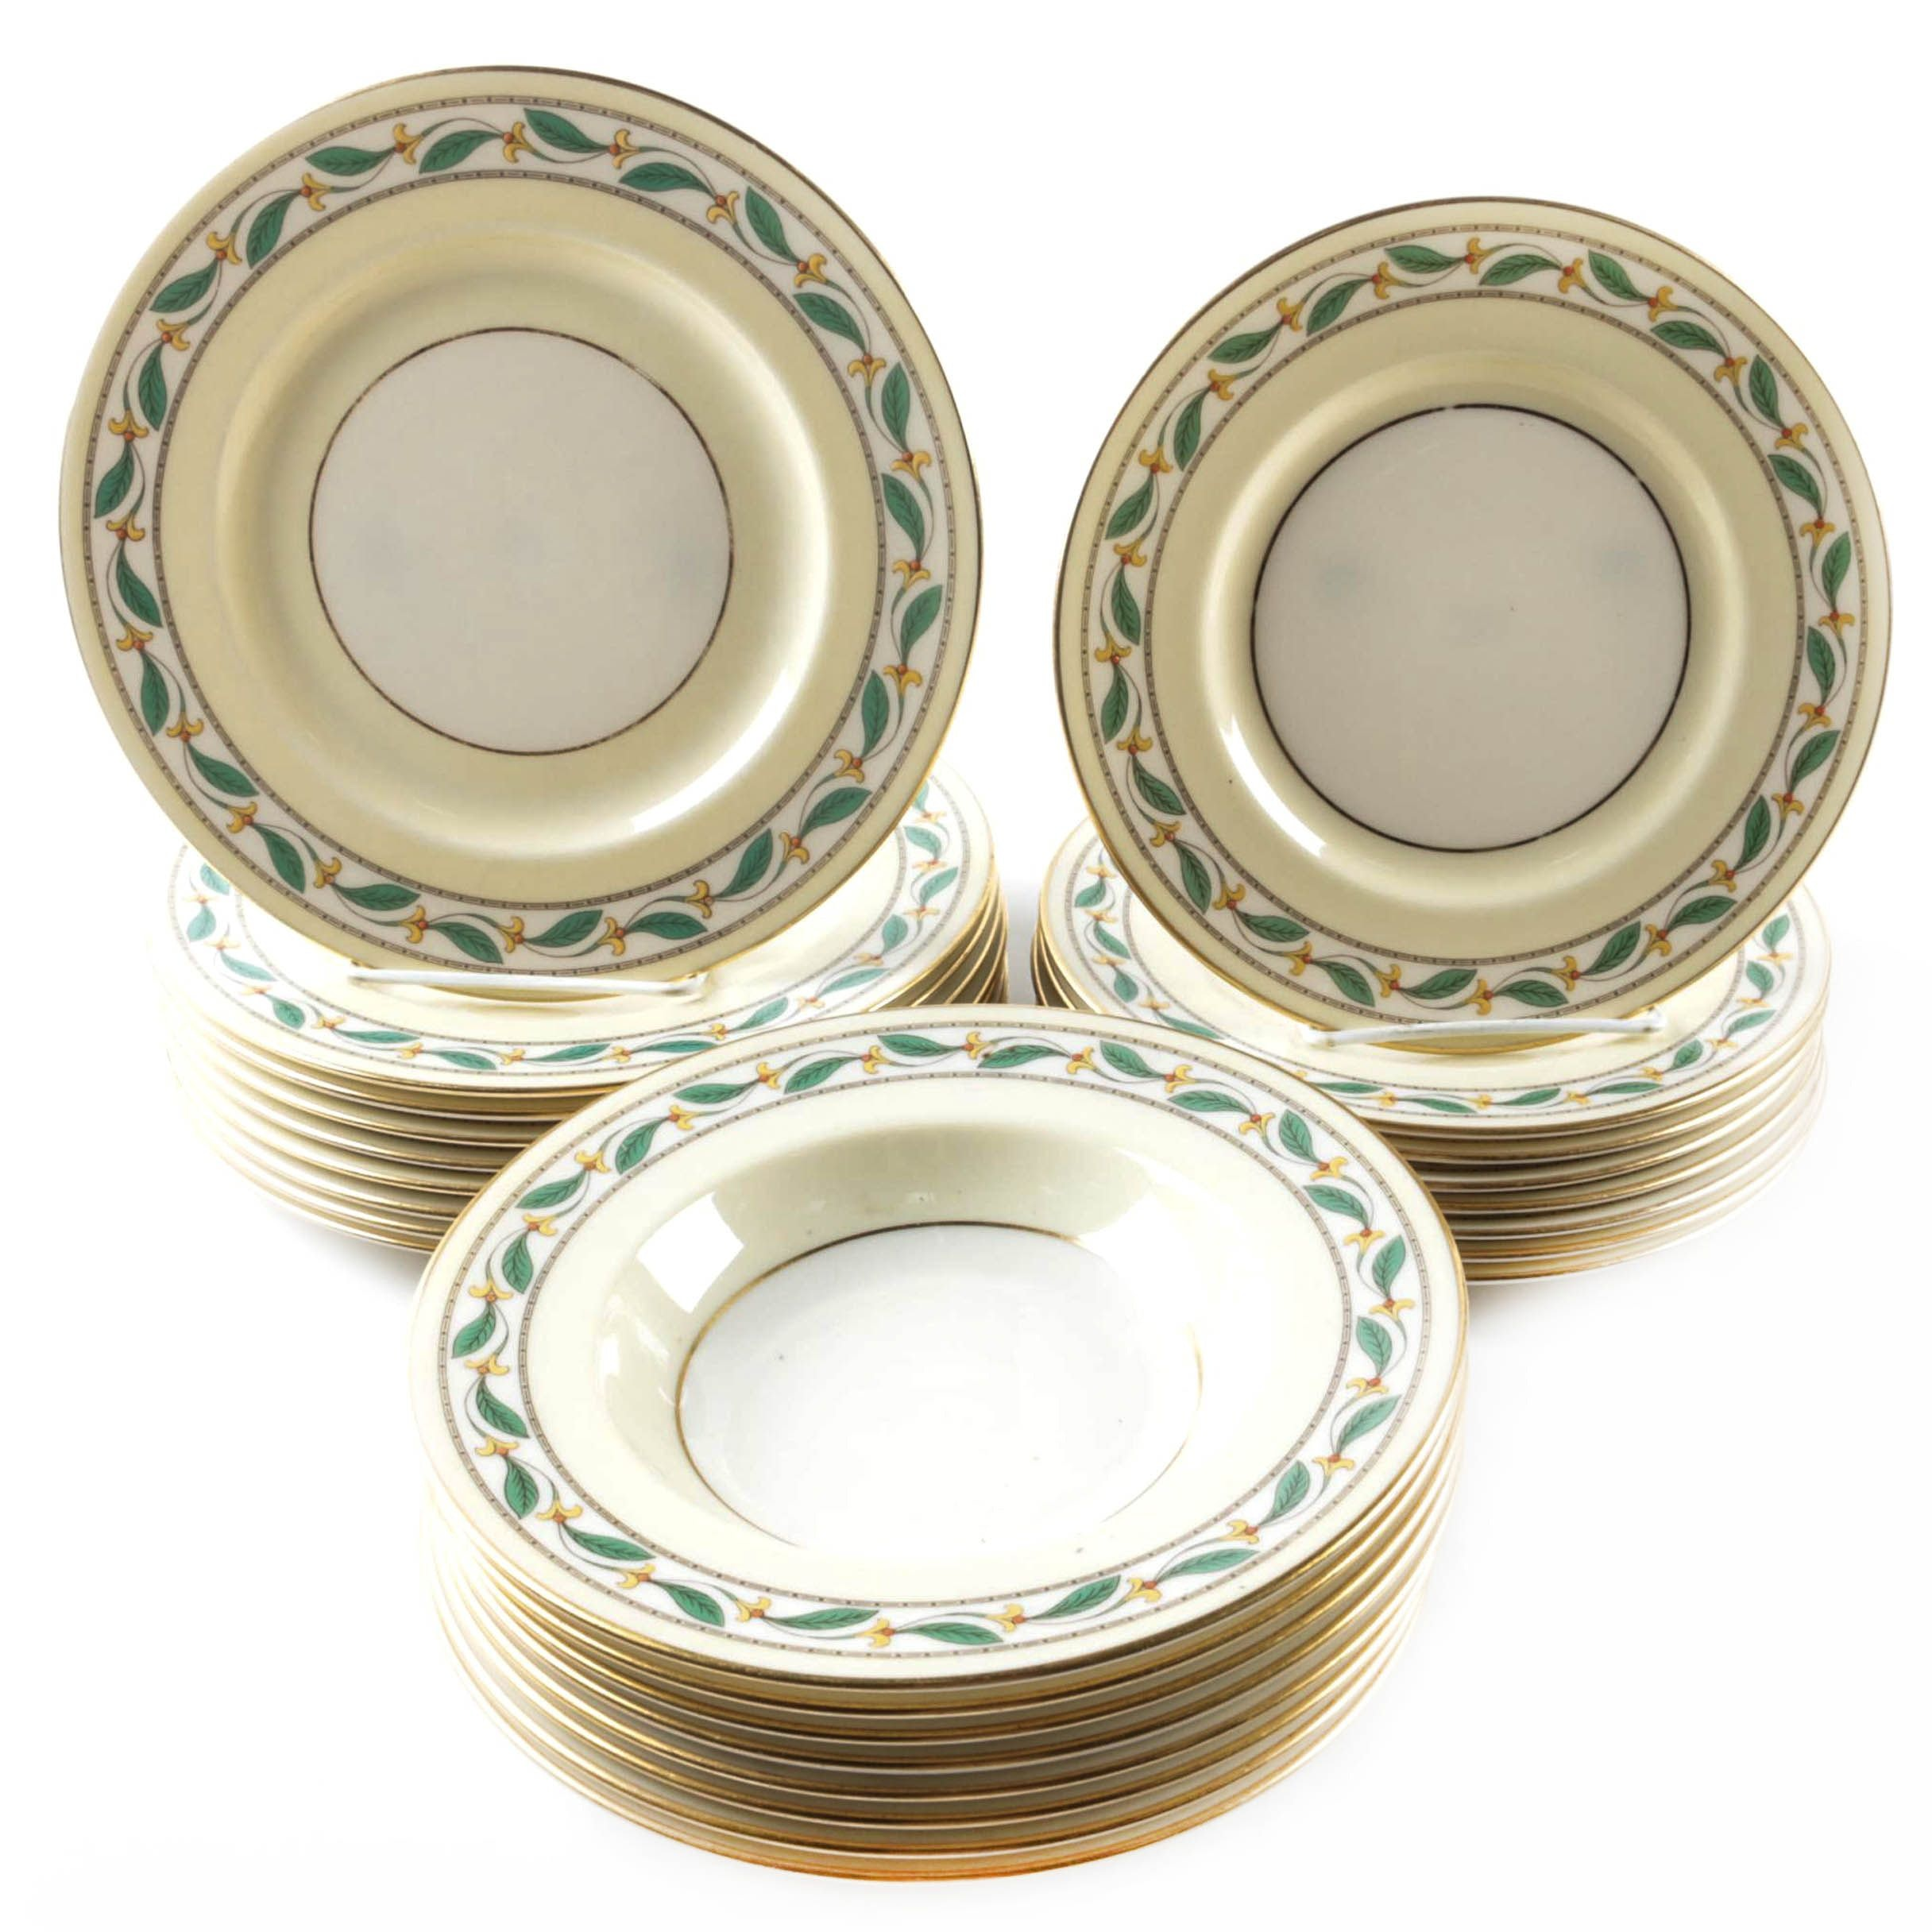 "Vintage Lenox ""Westbury"" Luncheon Plates, Salad Plates and Bowls"